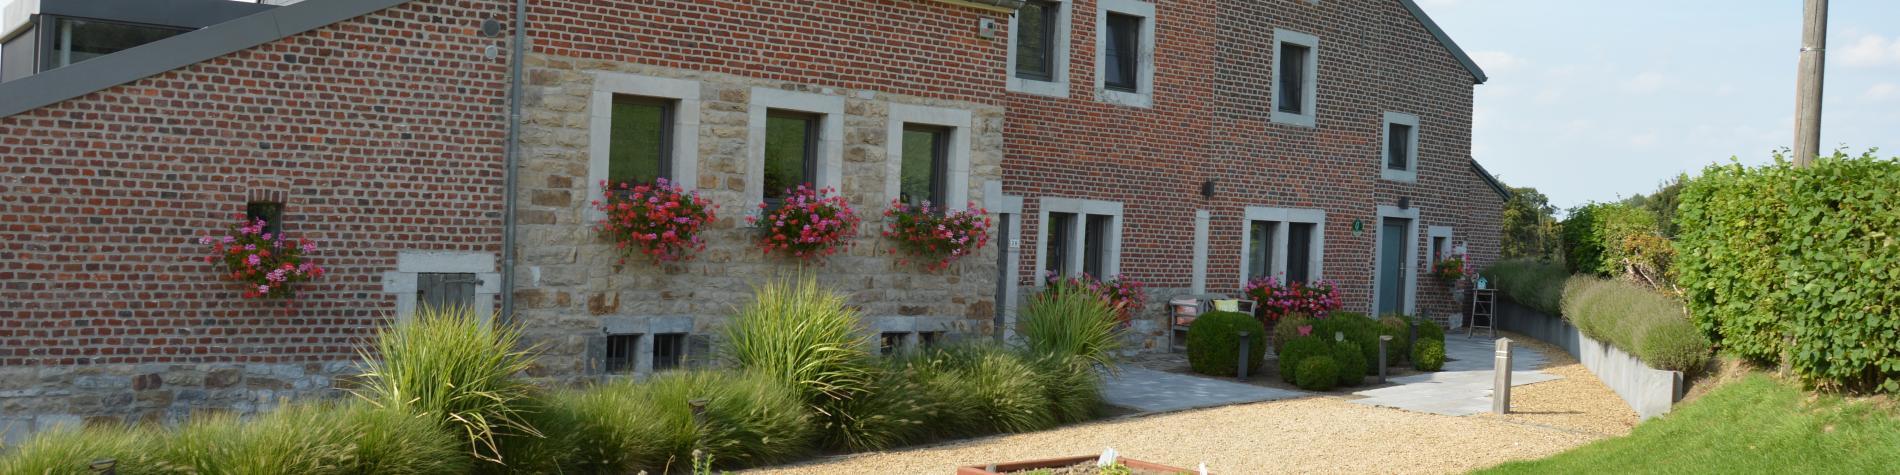 Gîte rural - Plaisir Campagne - Clermont-sur-Berwinne